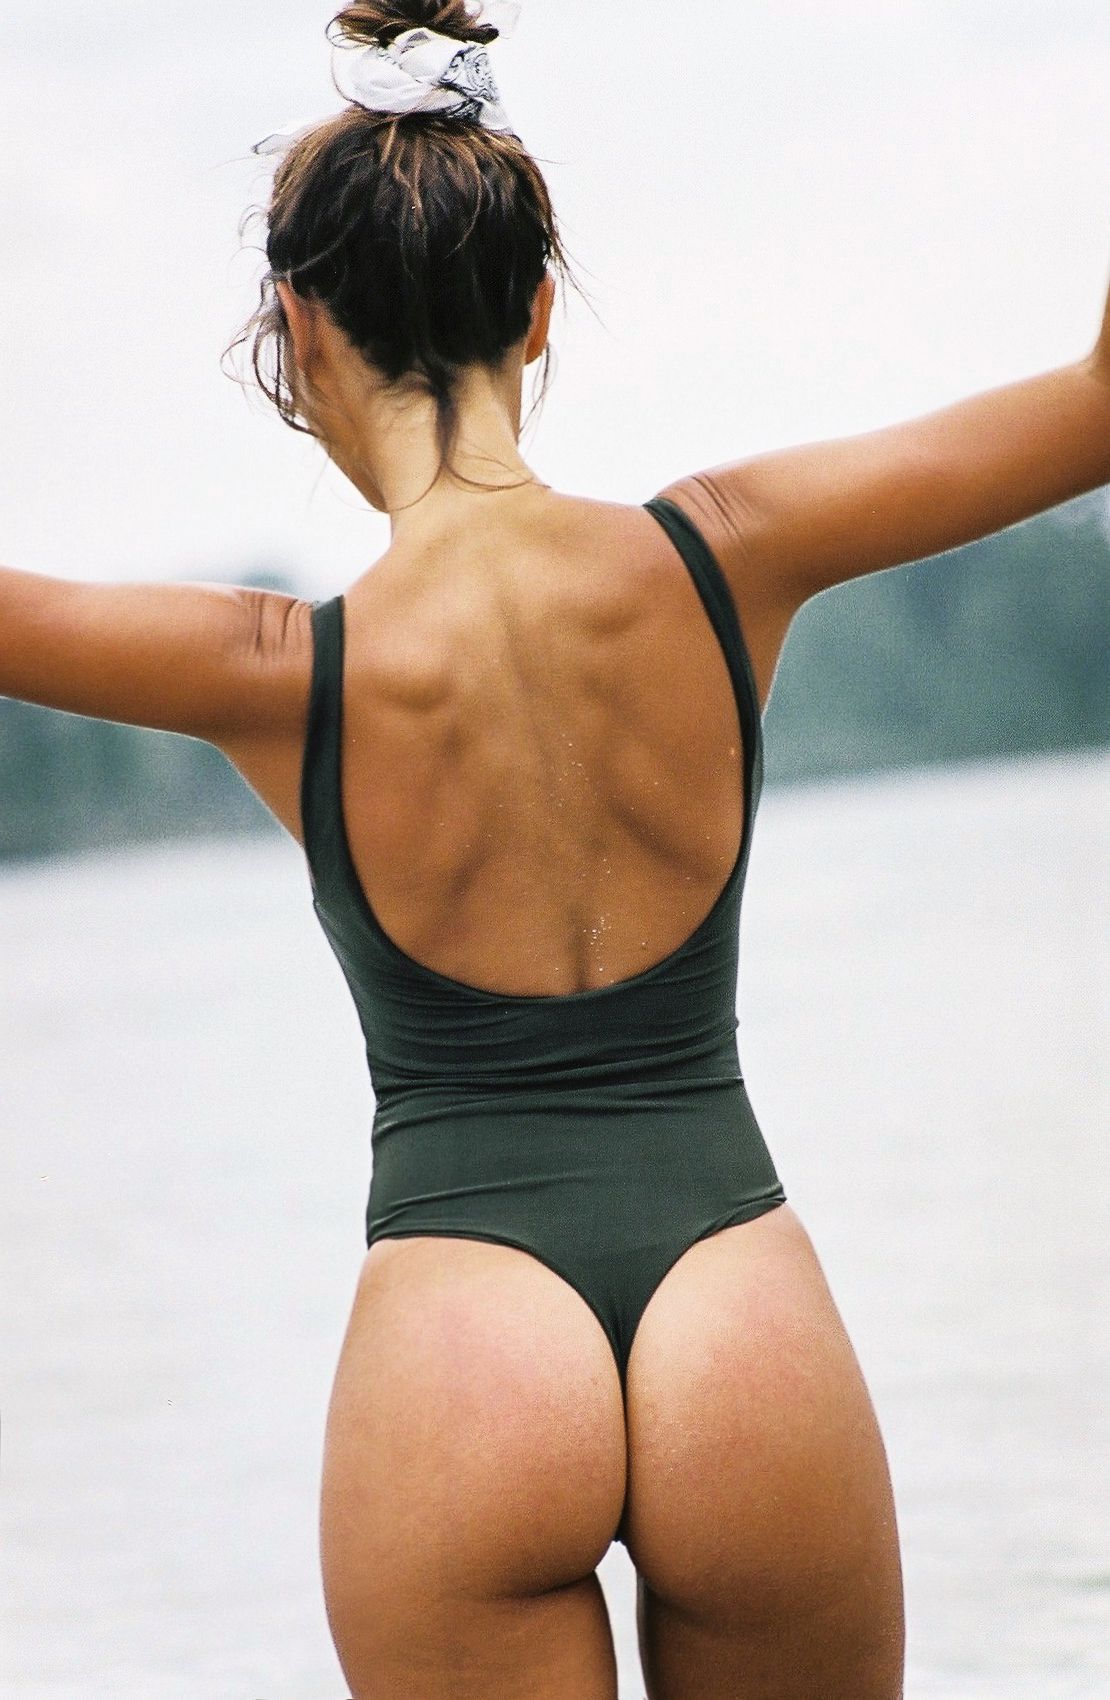 a7a29fe9ec5 Thong Leotard Blog : Photo Summer Swimwear, Bikini Swimwear, Bikinis,  Swimsuits, Bikini